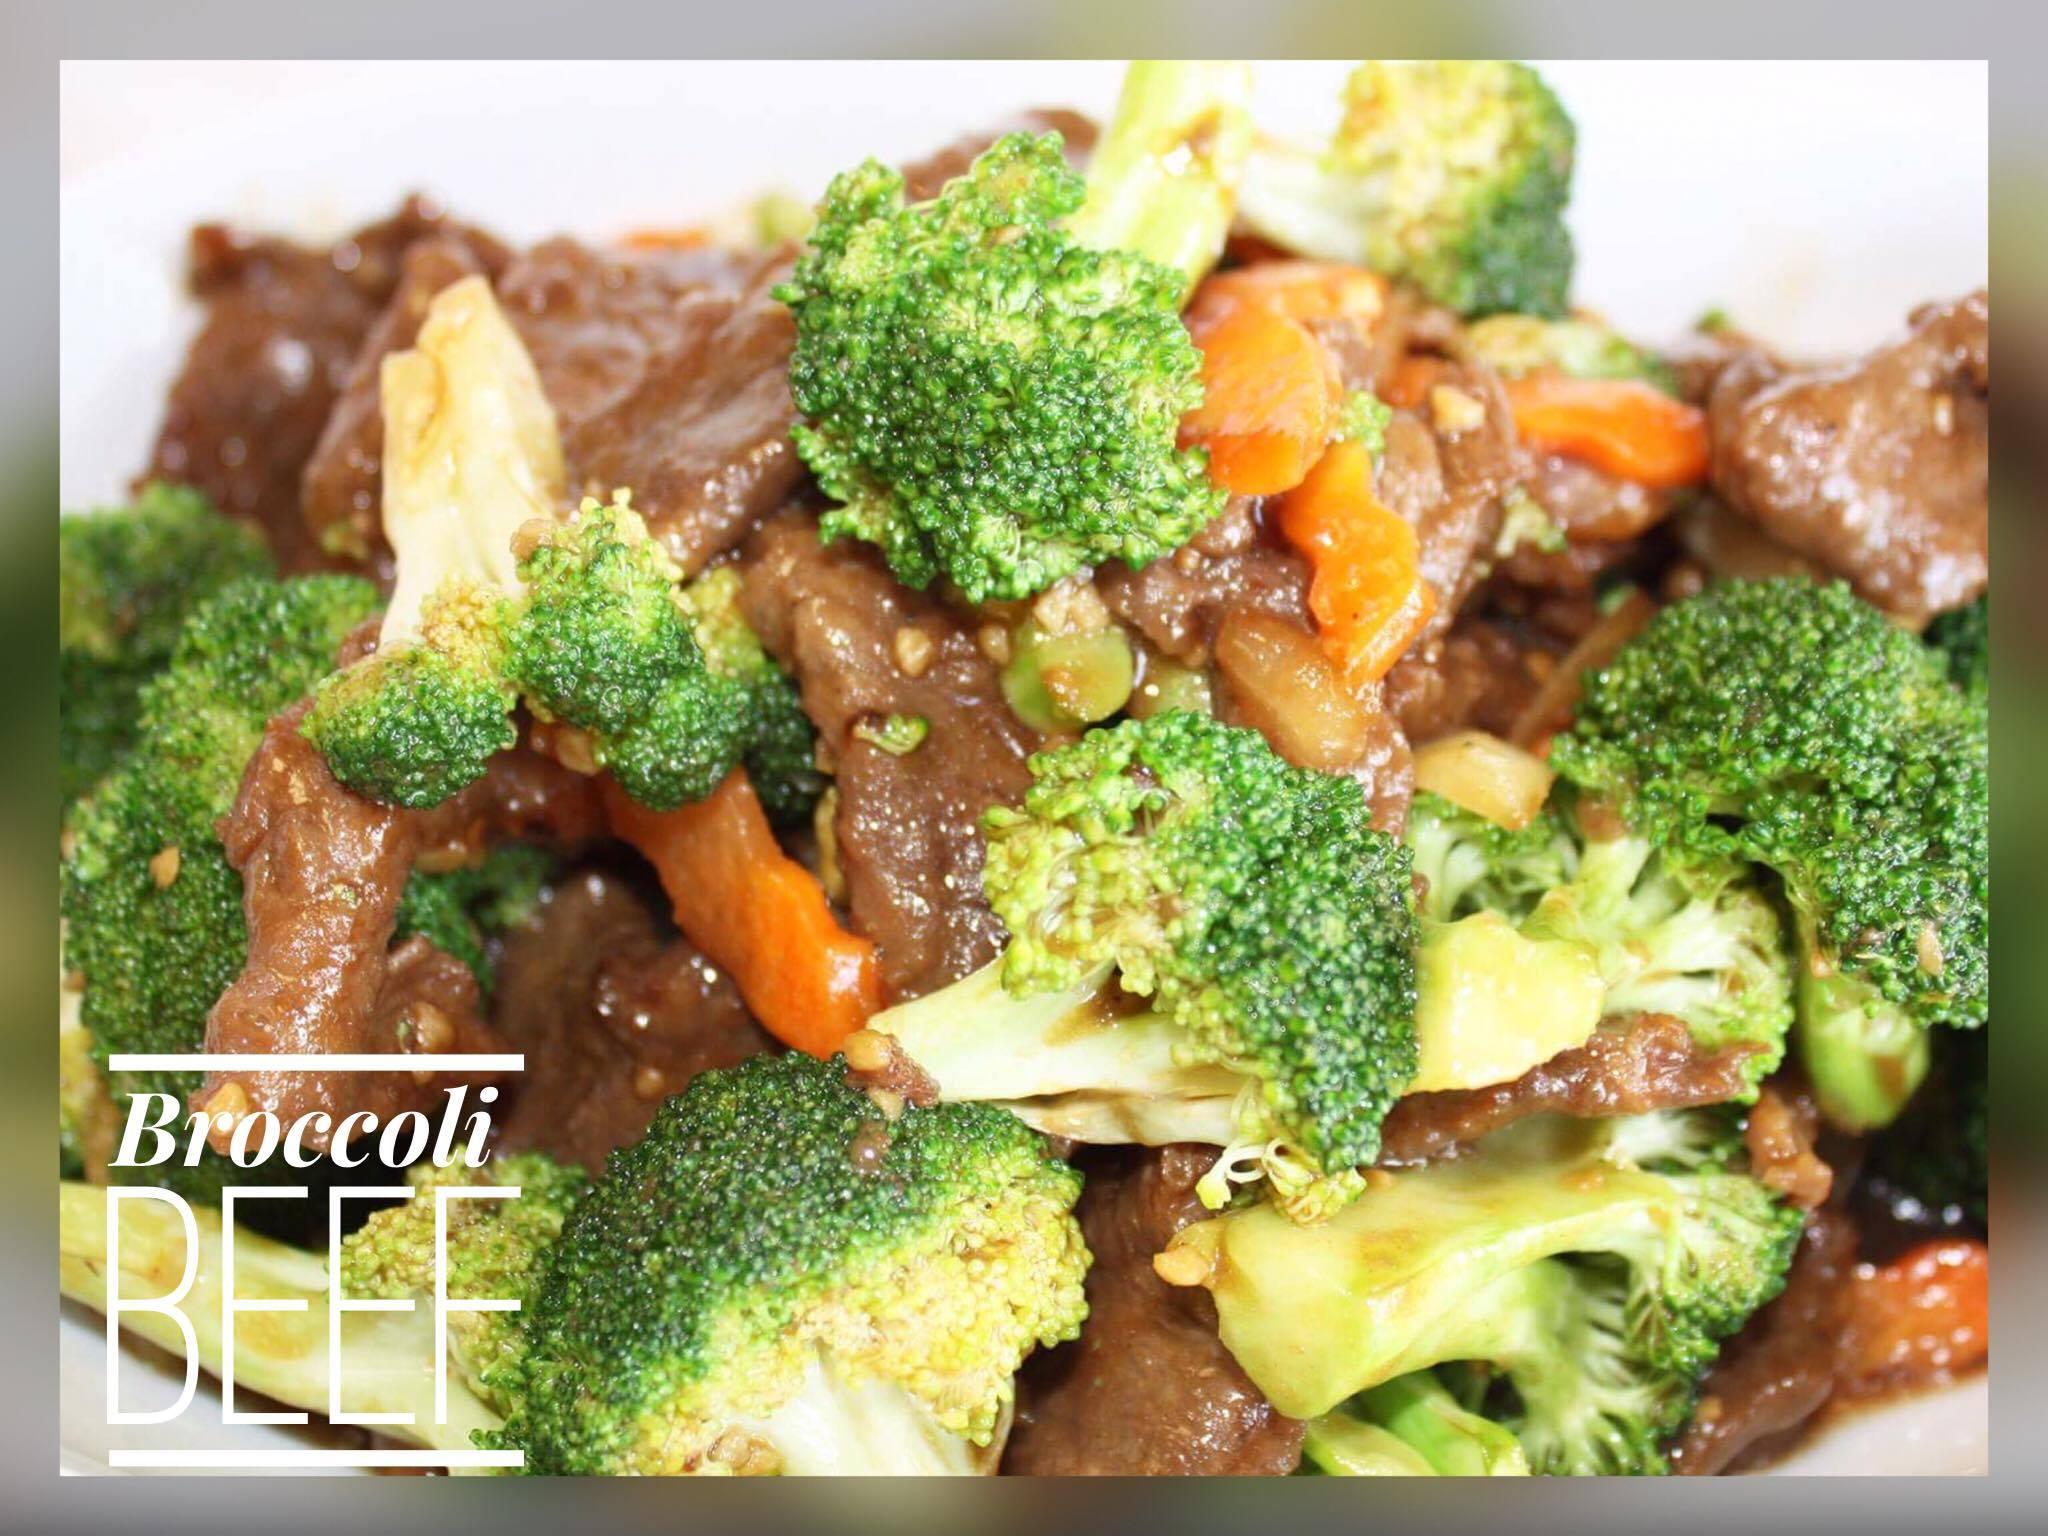 broccolibeef.jpg